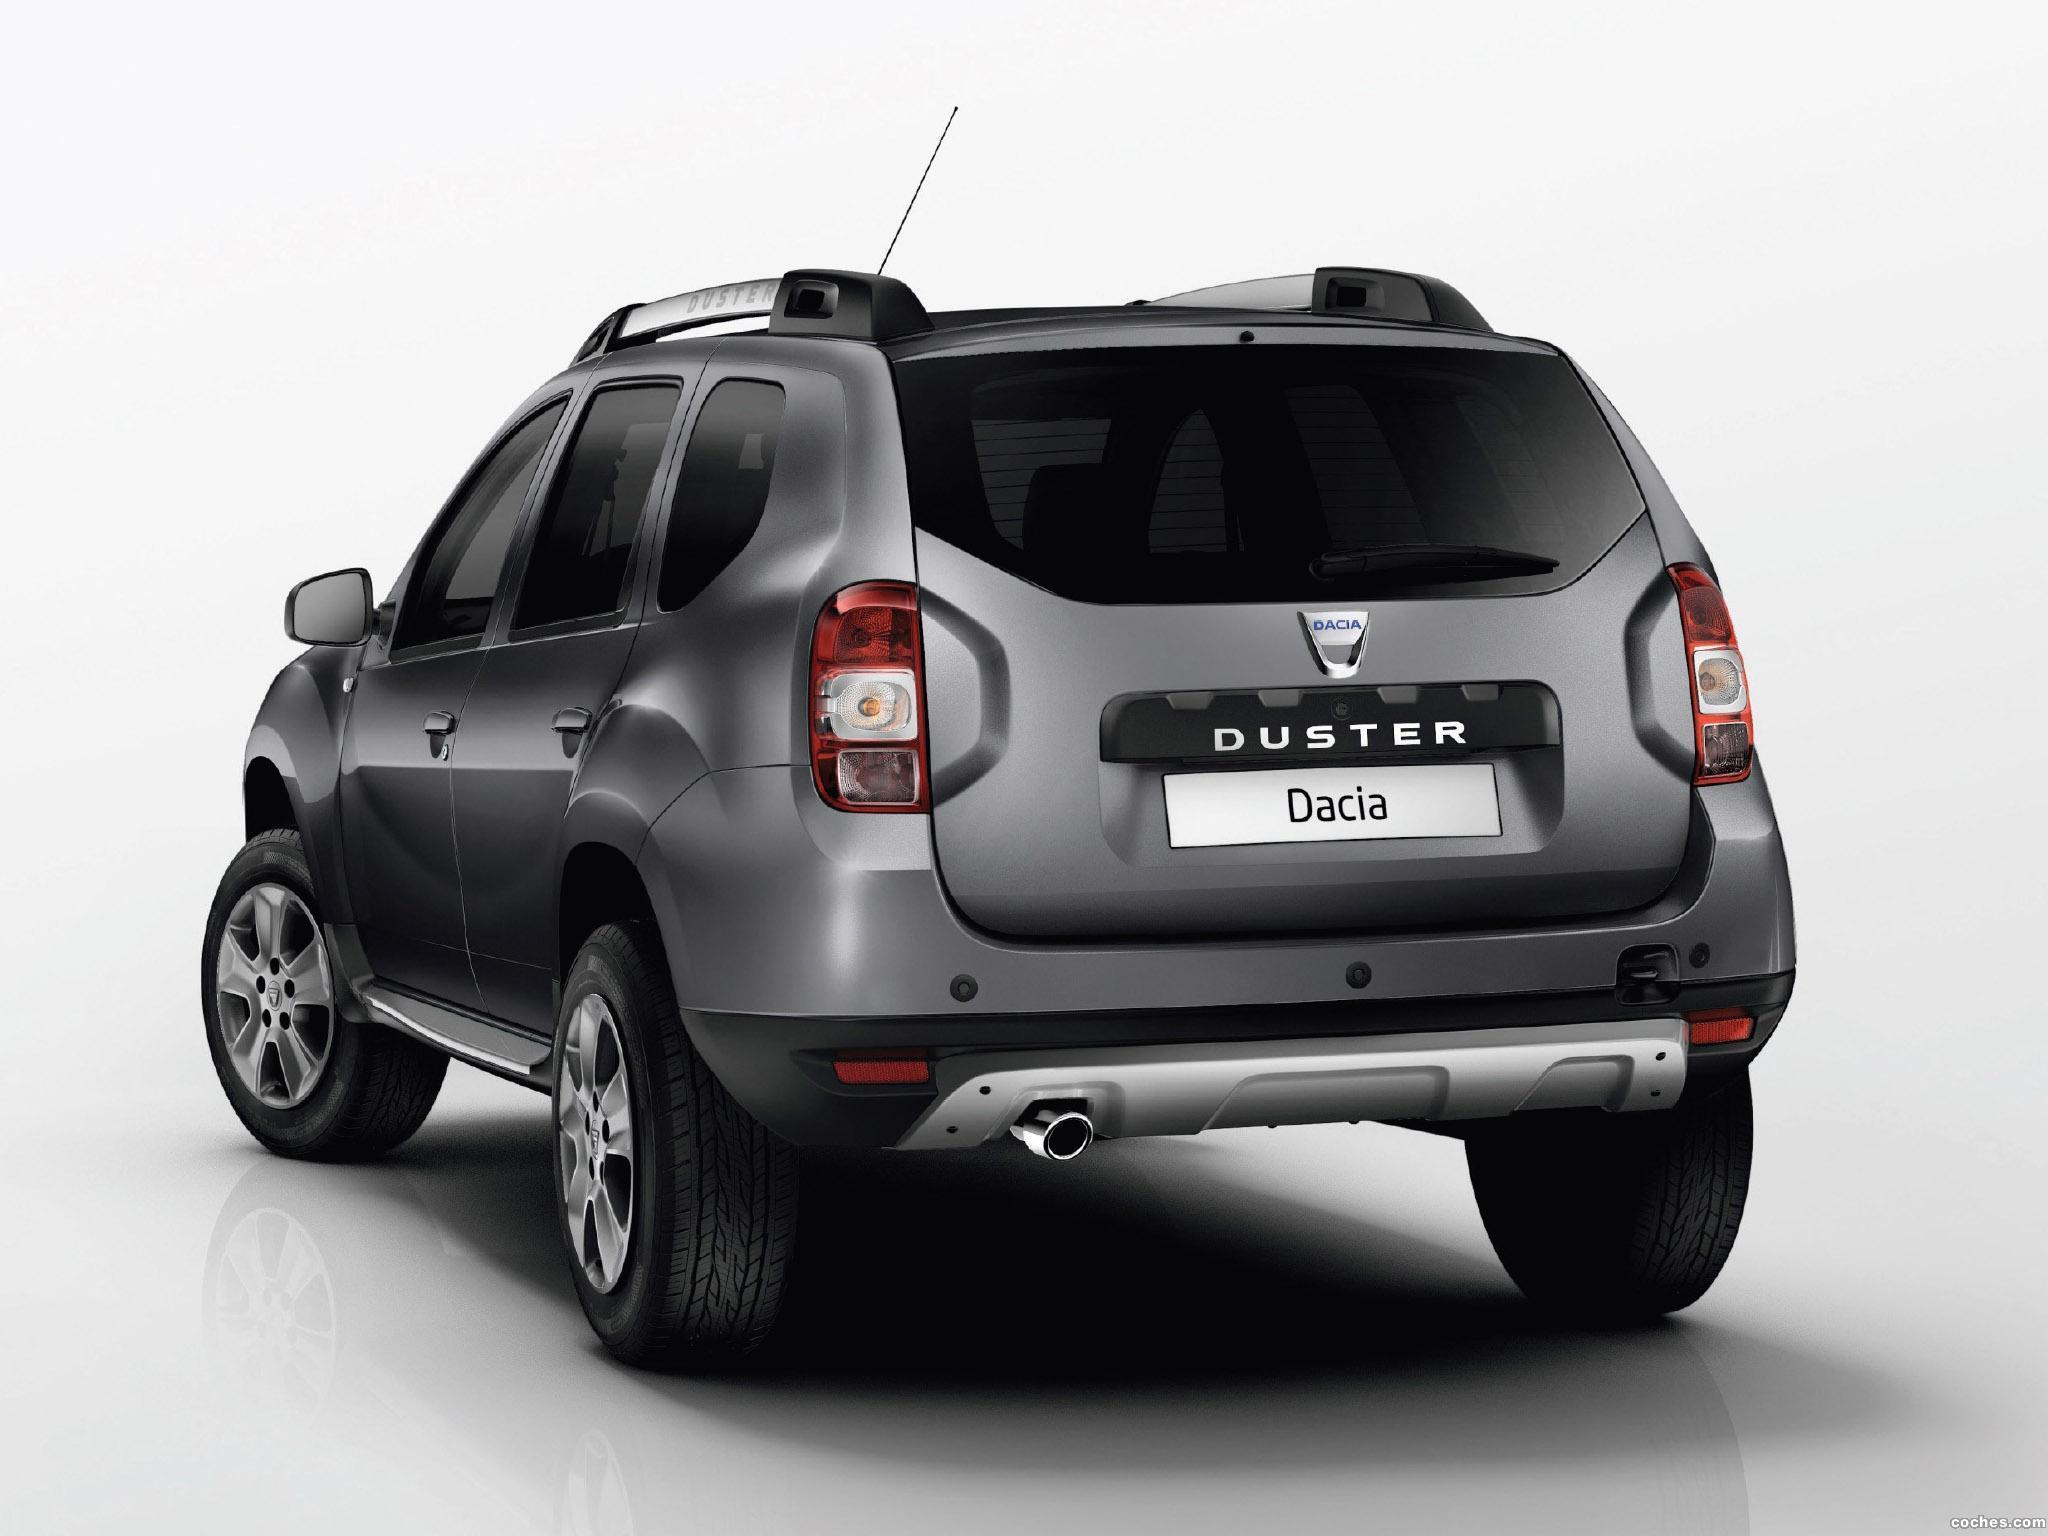 Foto 1 de Dacia Duster 2014